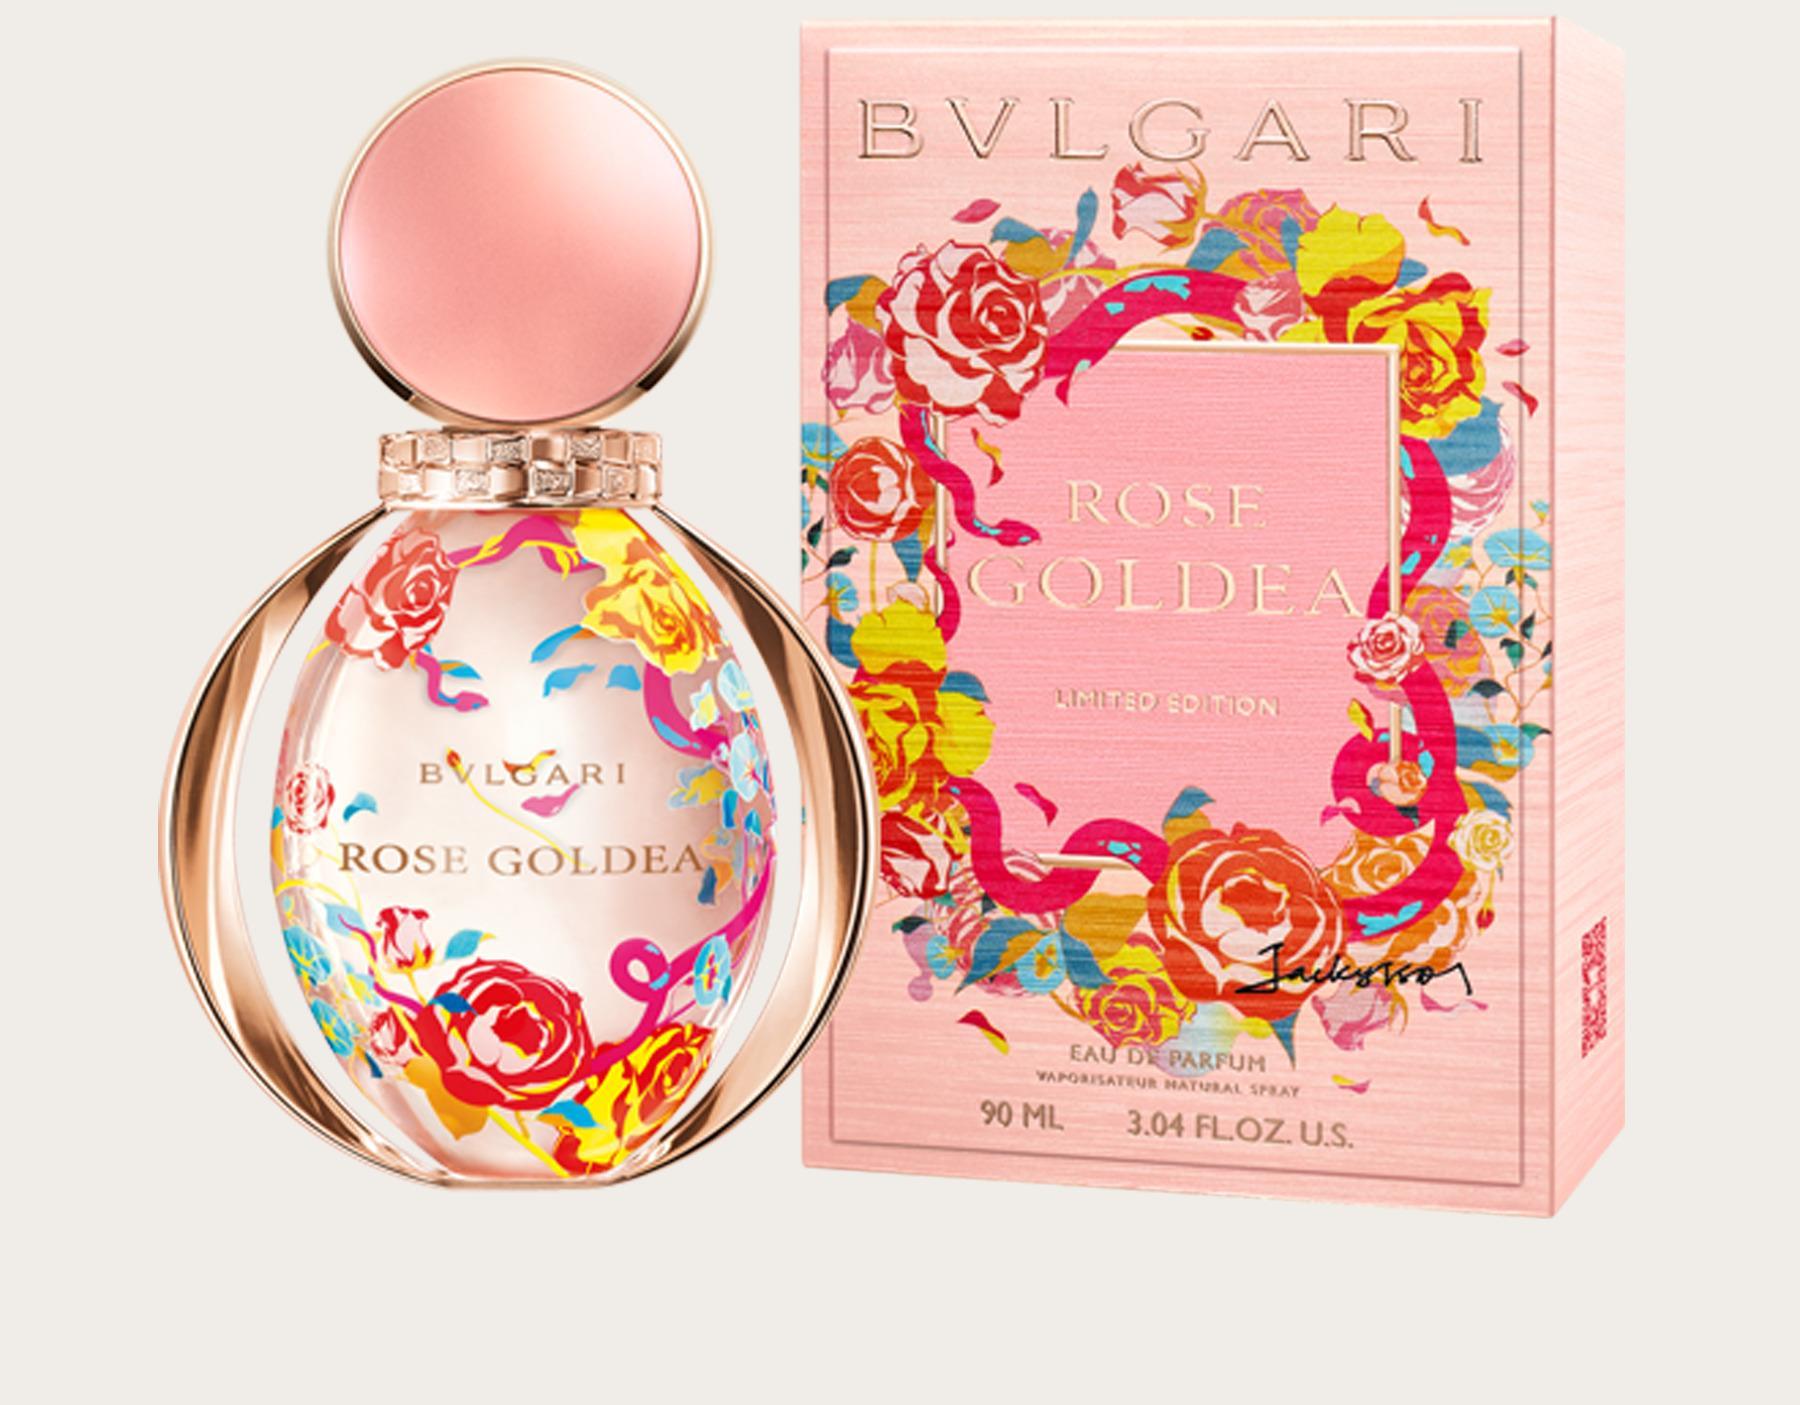 5dec8b80c4c3 Rose Goldea Jacky Tsai Edition Bvlgari perfume - a new fragrance for ...